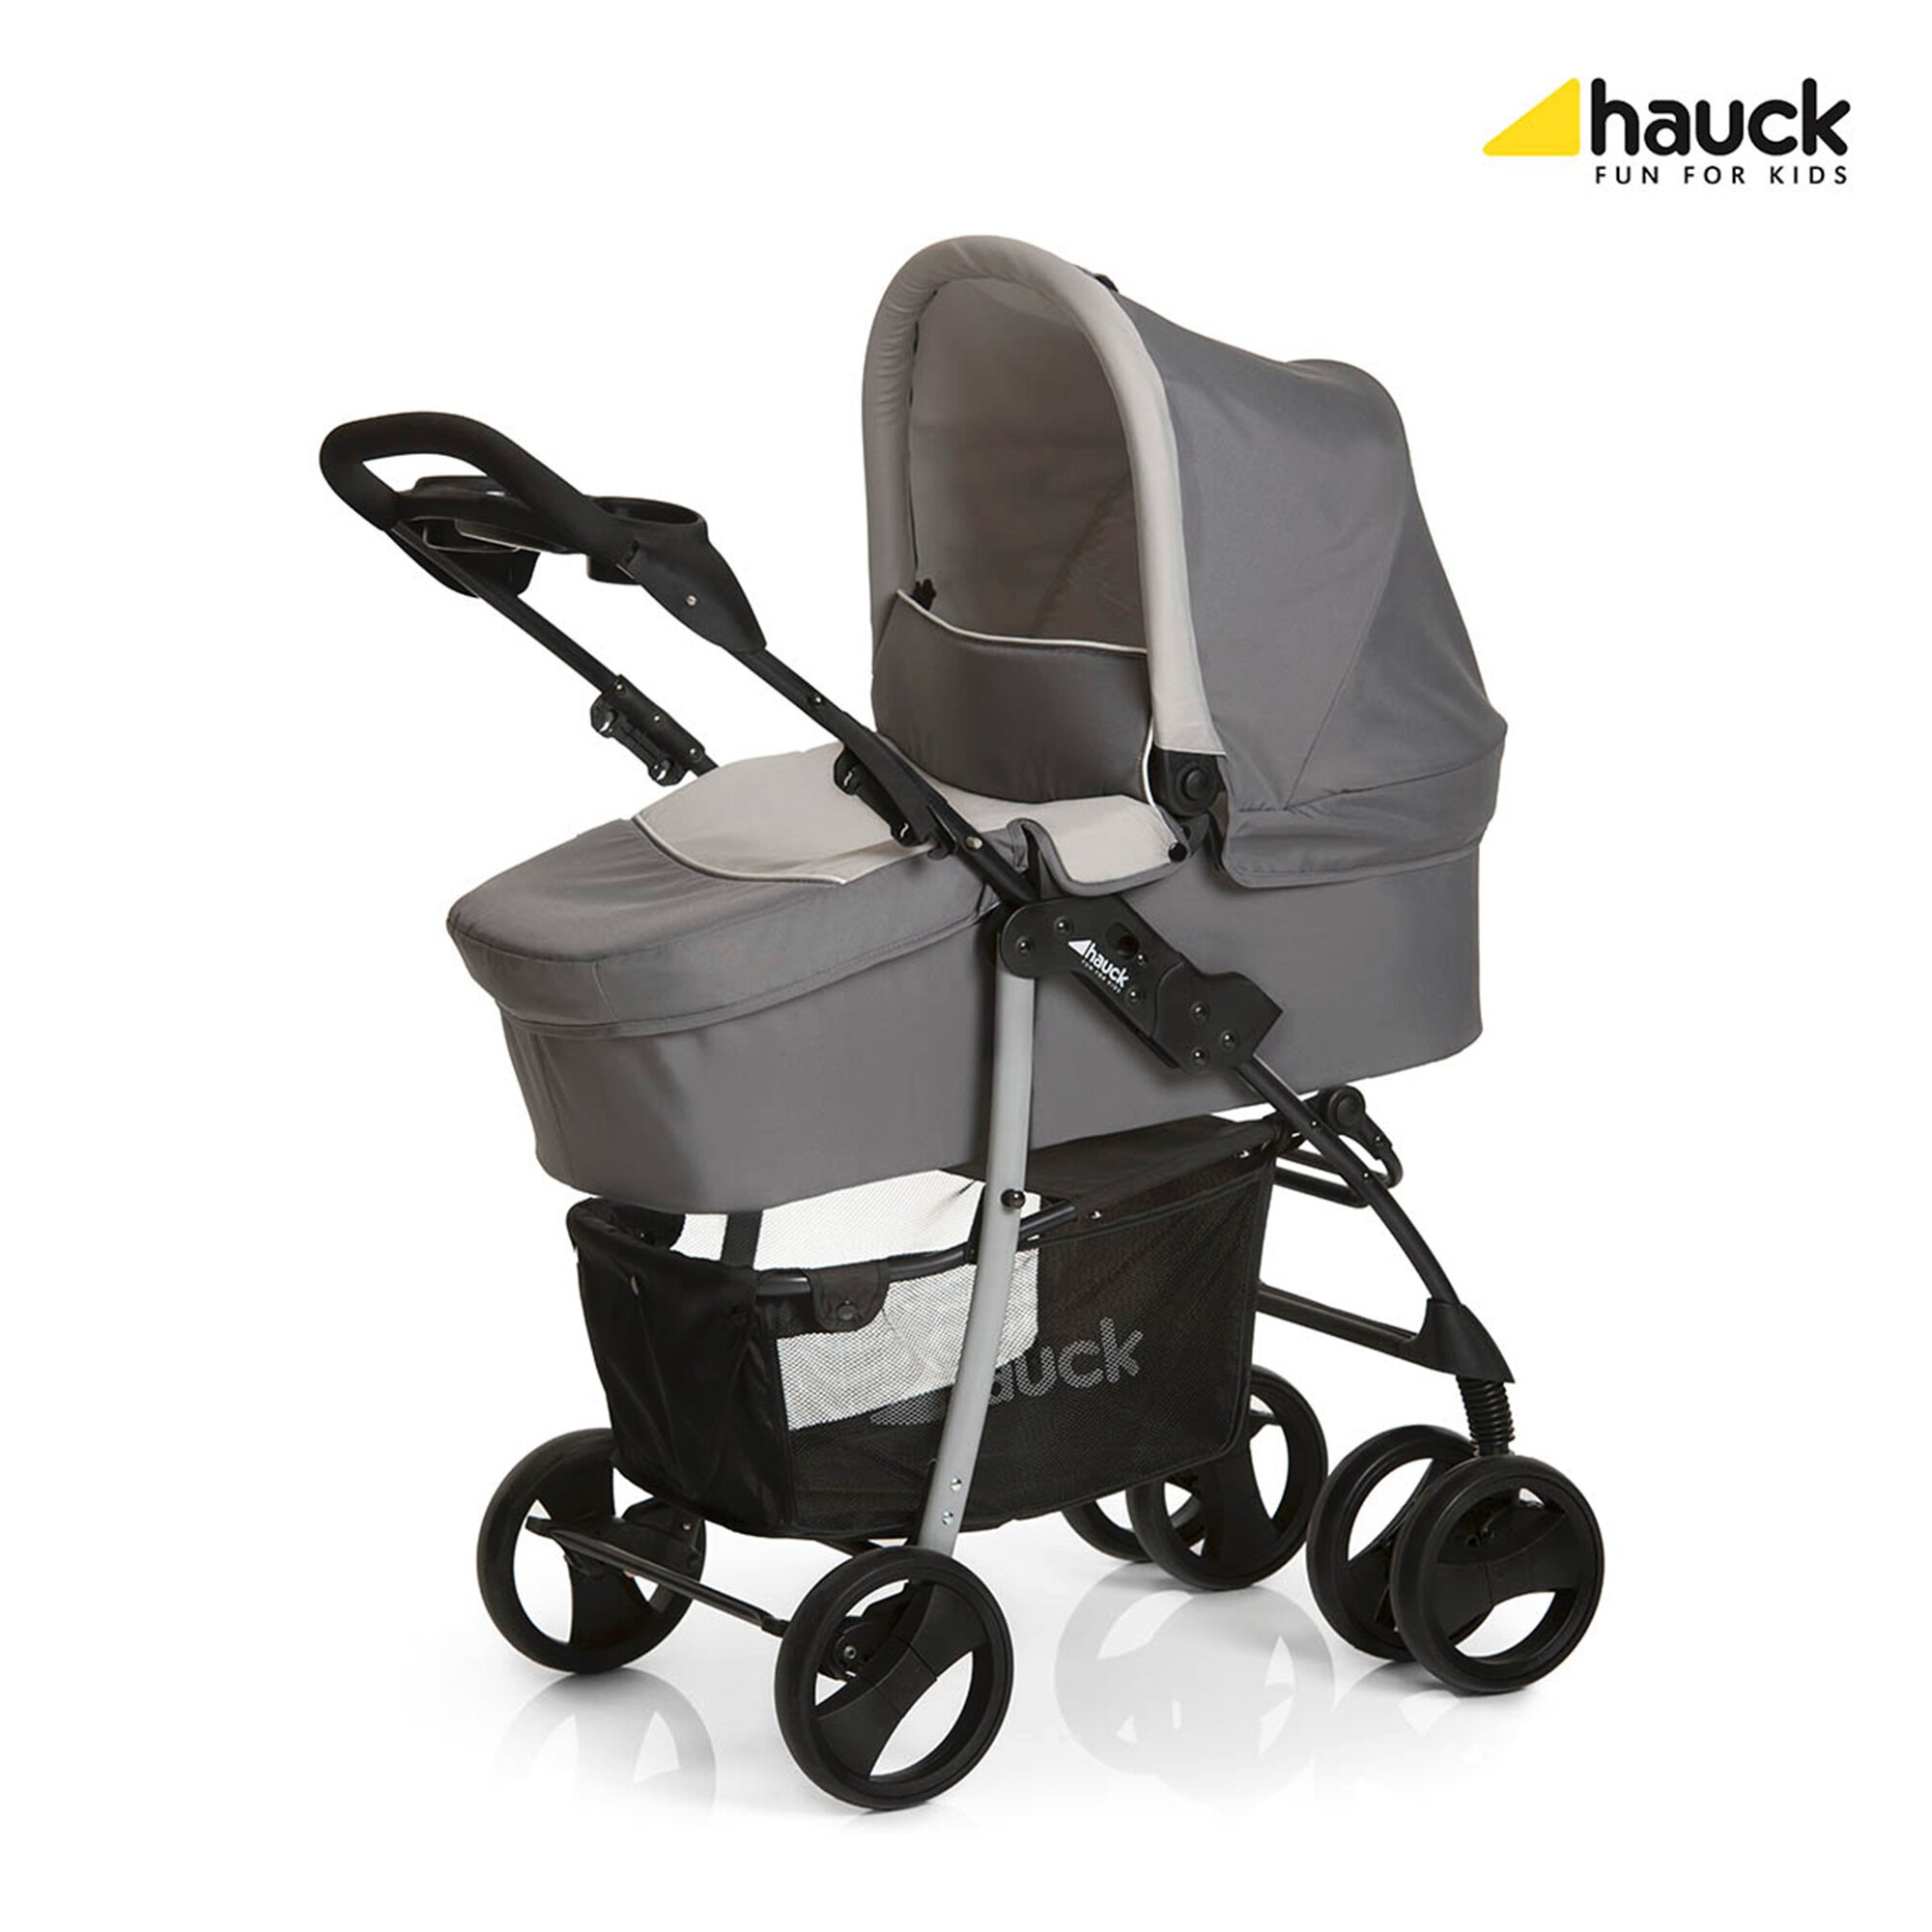 hauck-shopper-slx-kombikinderwagen-trio-set-design-2016-grau